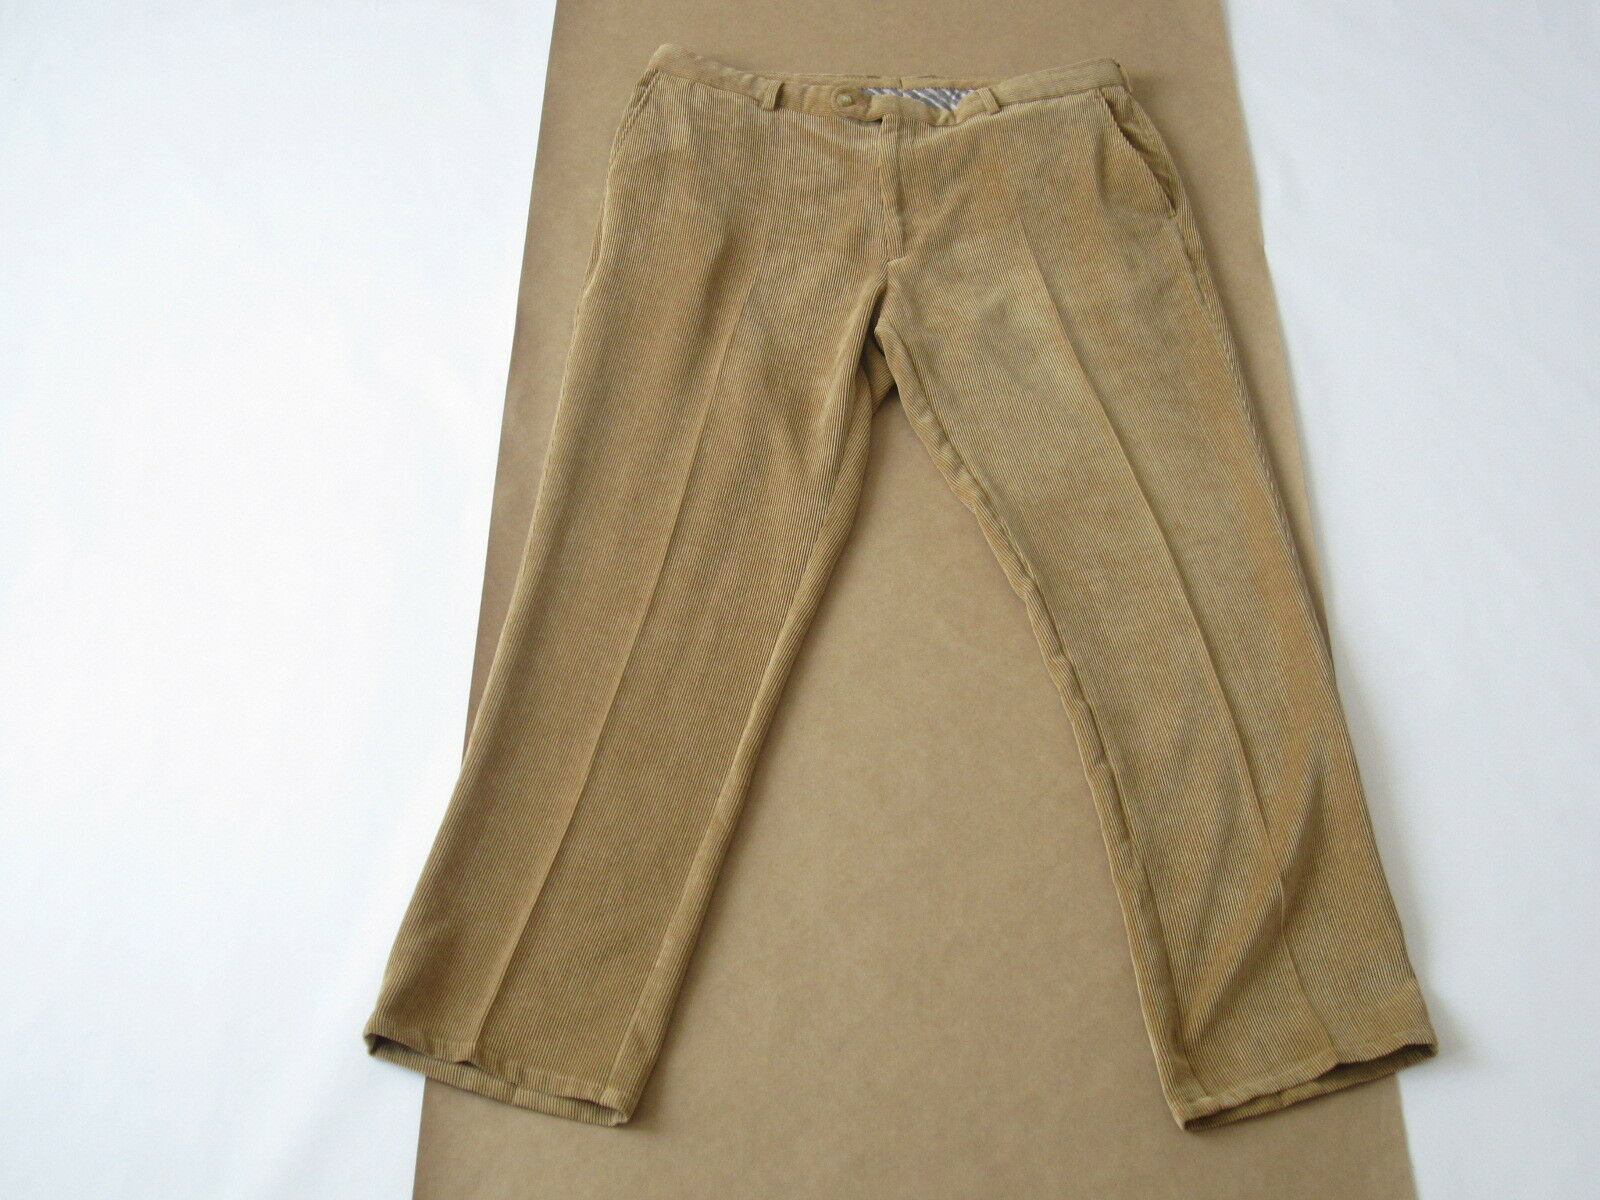 Men's Peter Millar Nanoluxe Corduroy Pants Size 40